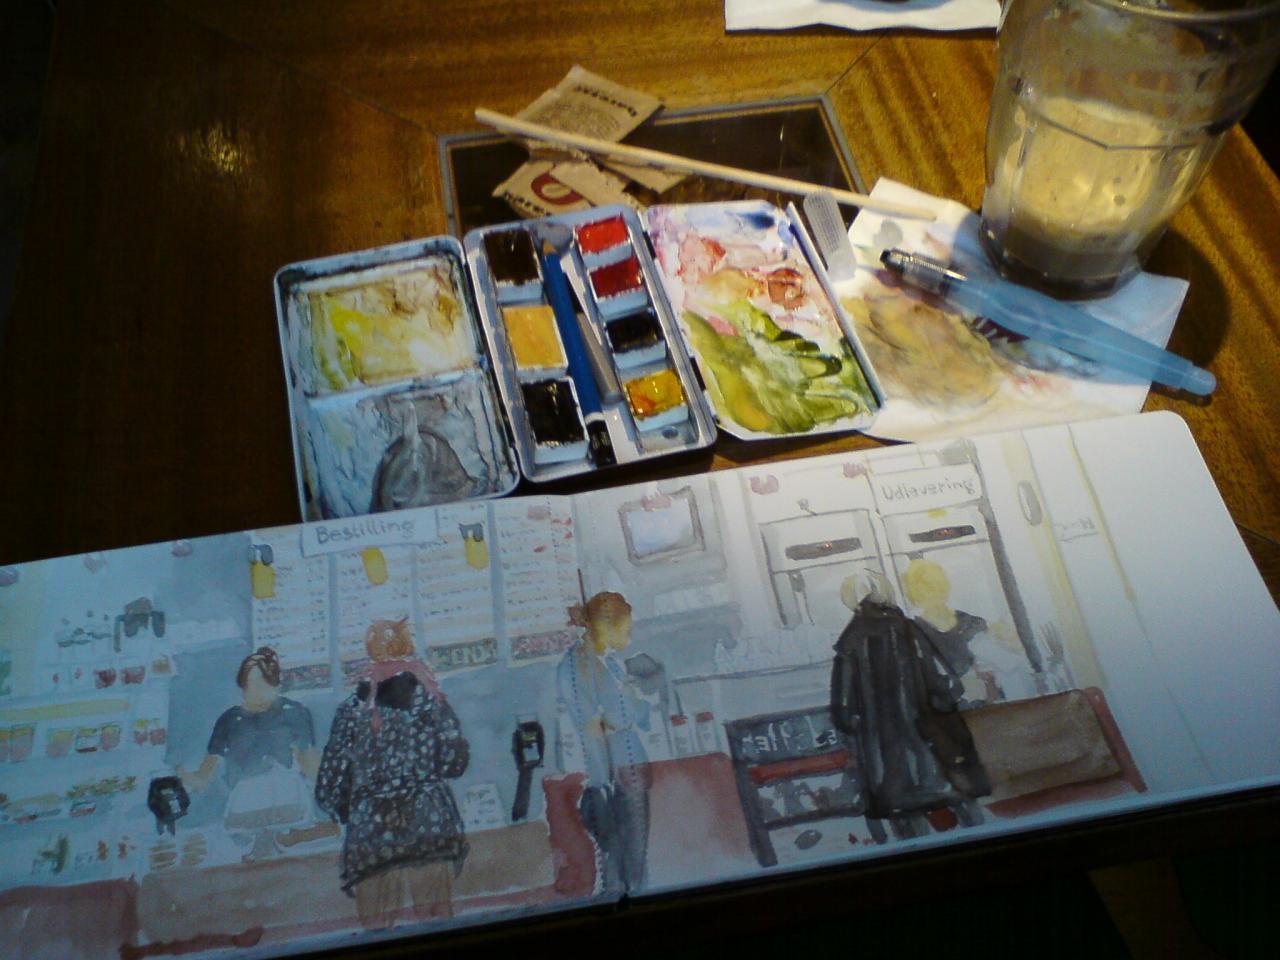 Kaffebar - sketchbreak